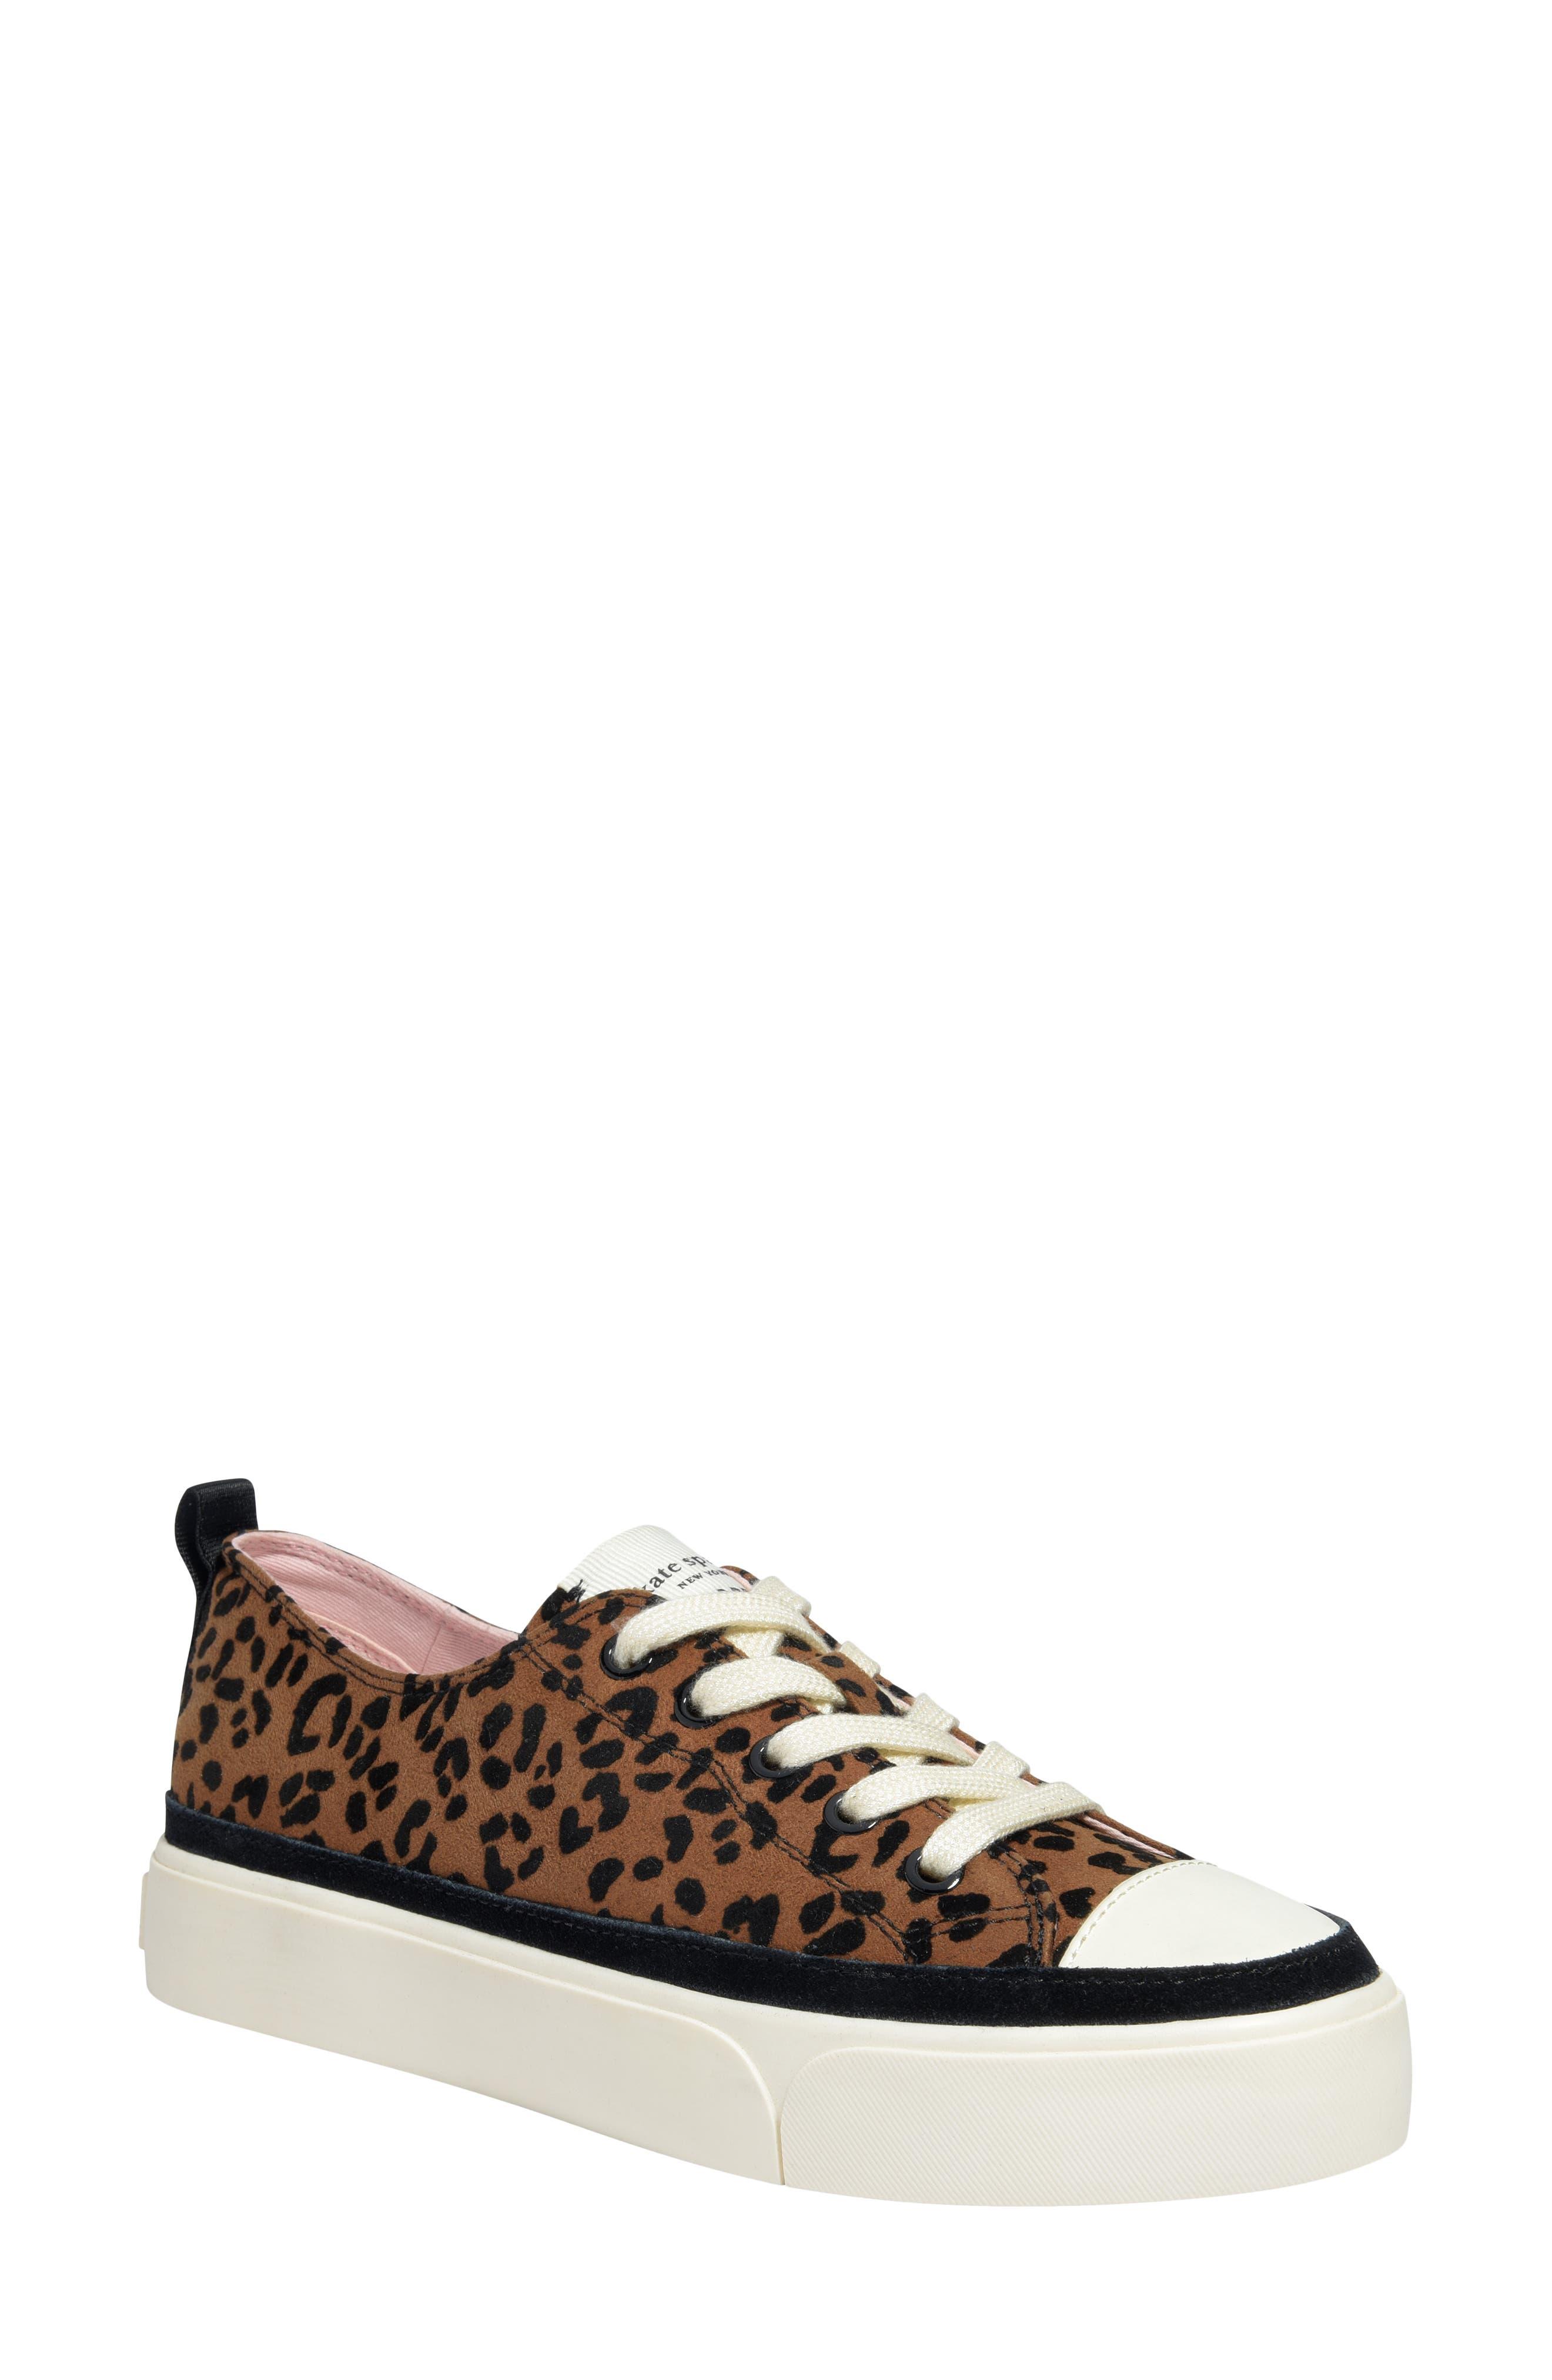 kate spade running shoes